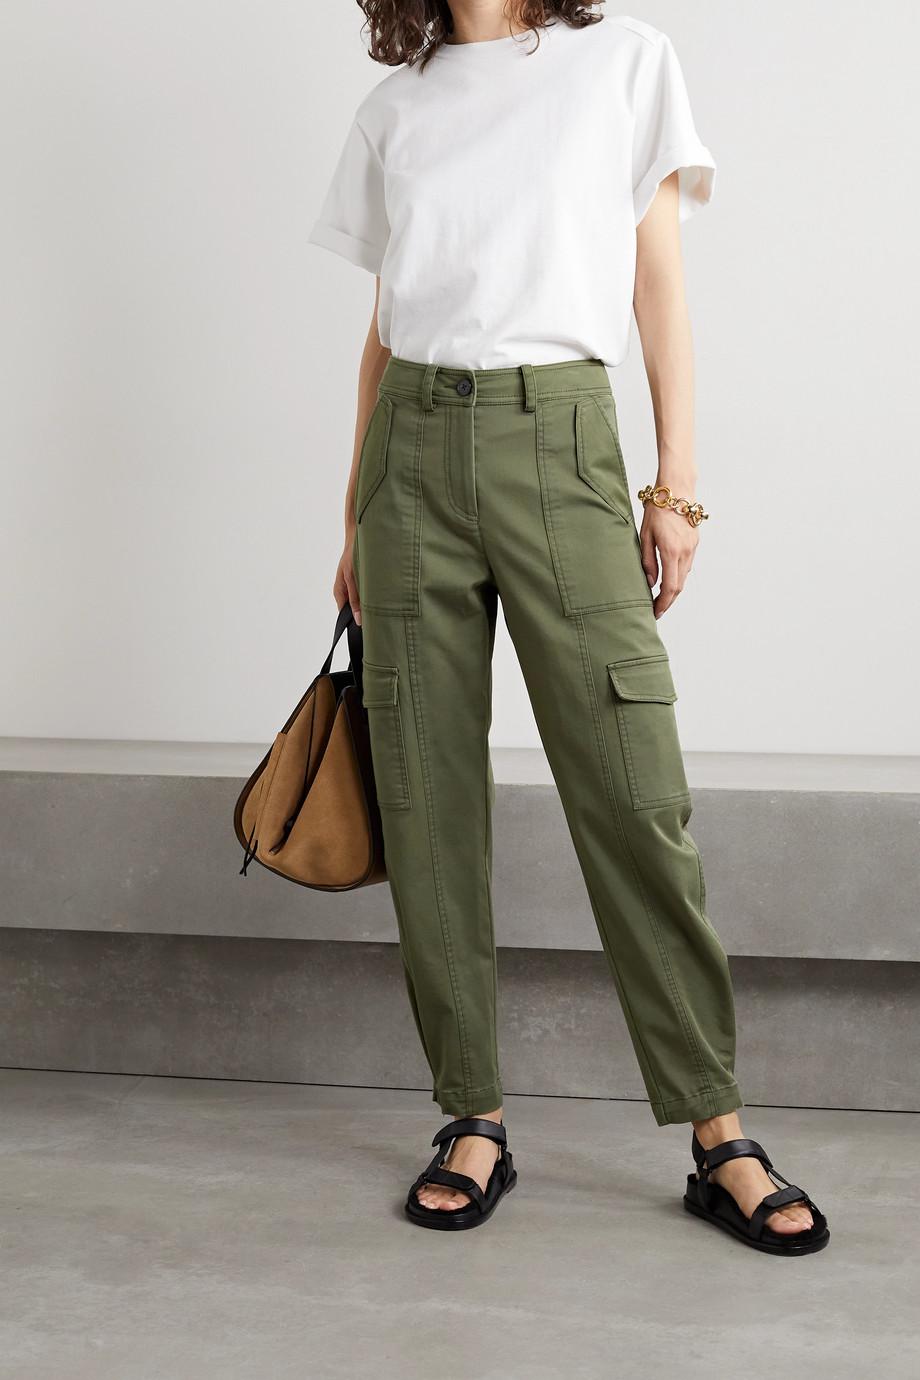 Derek Lam 10 Crosby Elian cropped cotton-blend twill tapered cargo pants